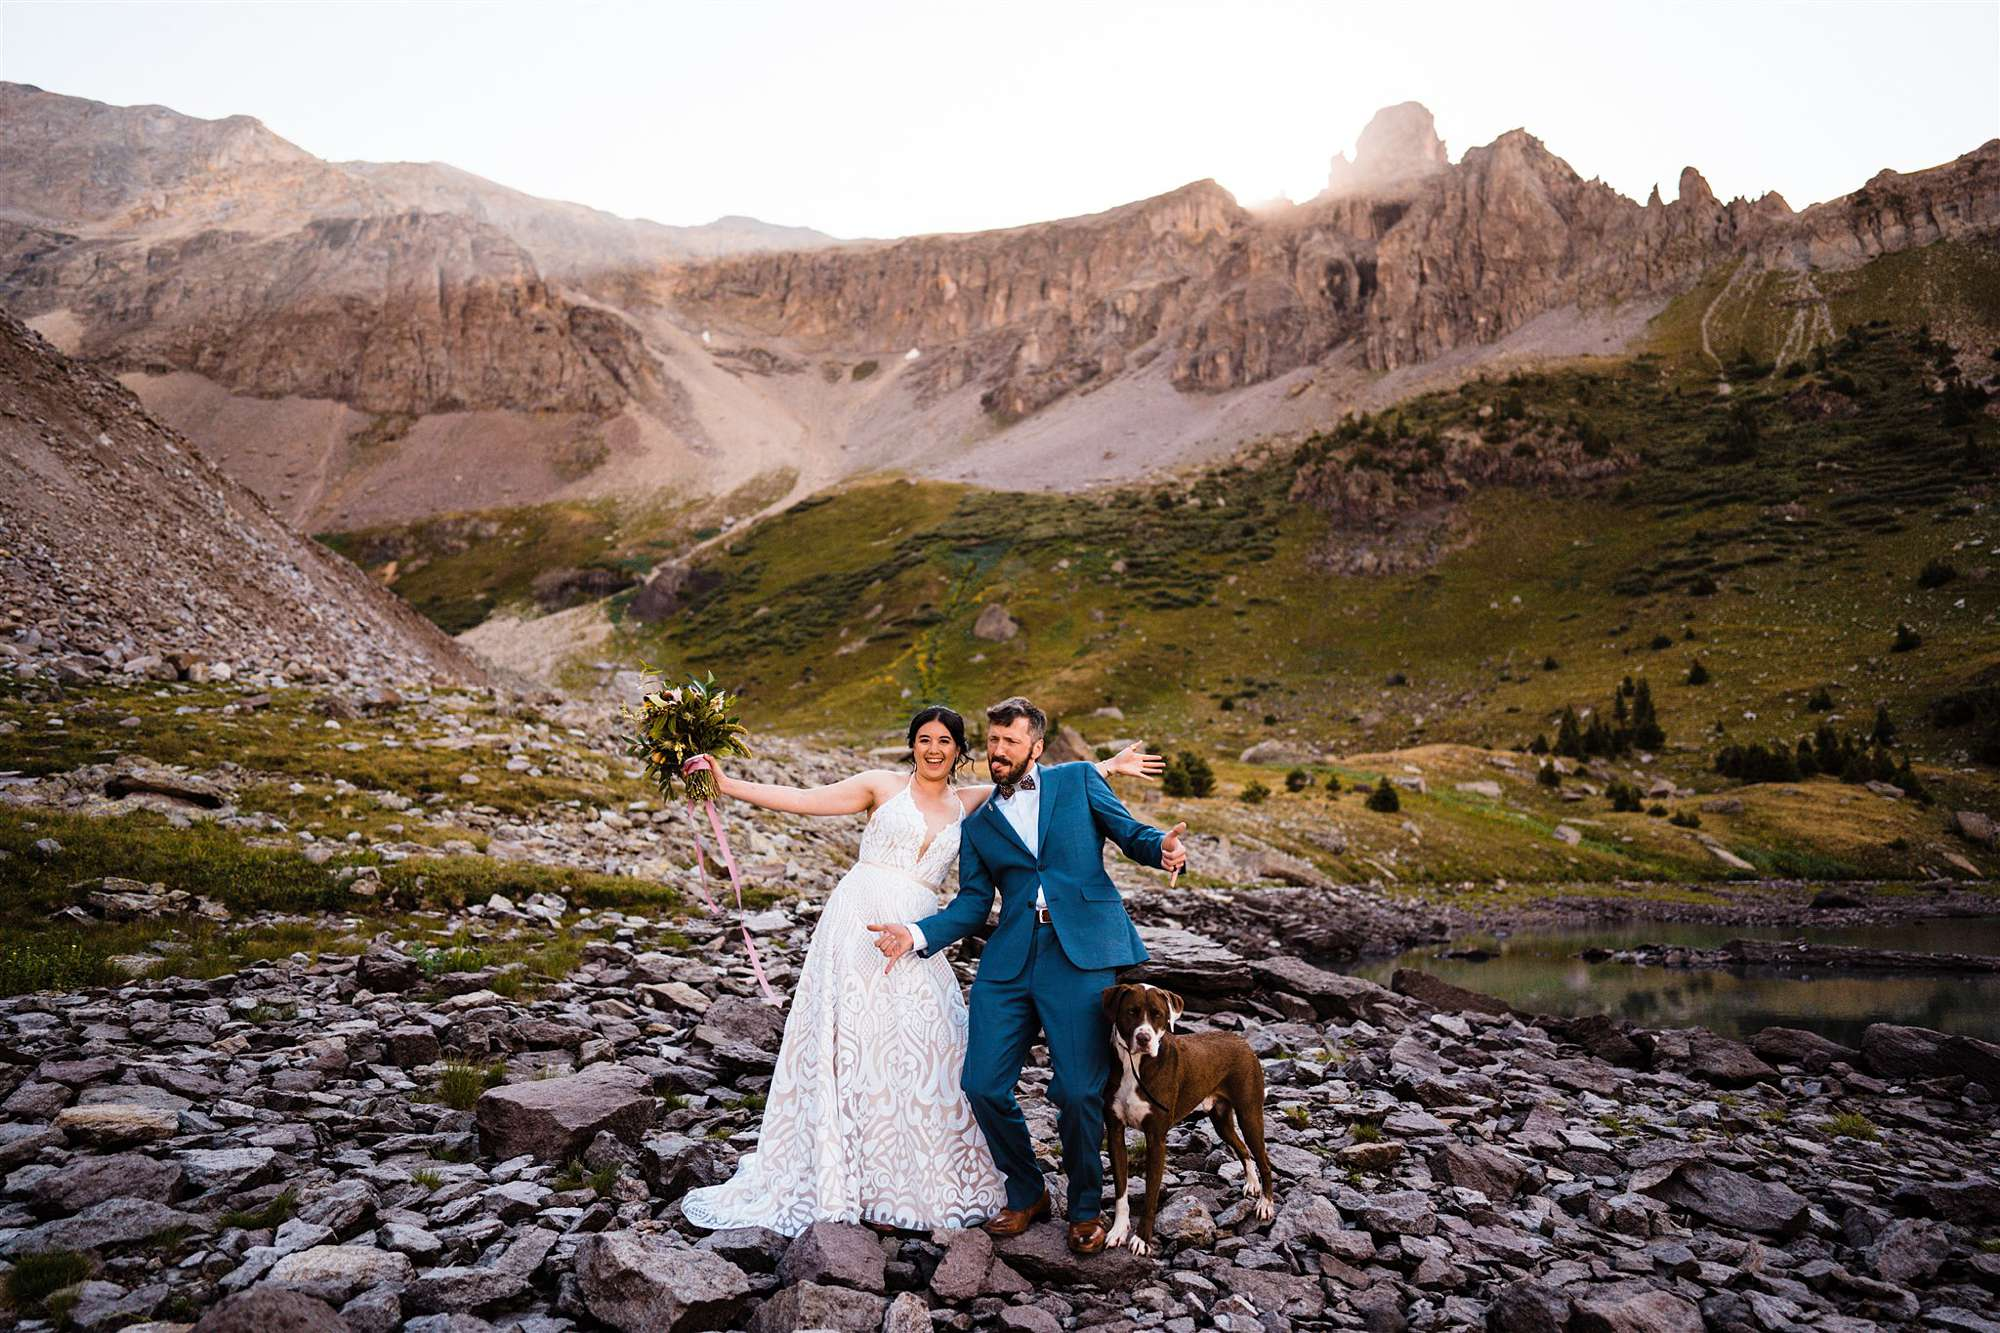 Colorado_Jeeping_Elopement_Emily_Matt_The_Foxes_Photography_0036.jpg